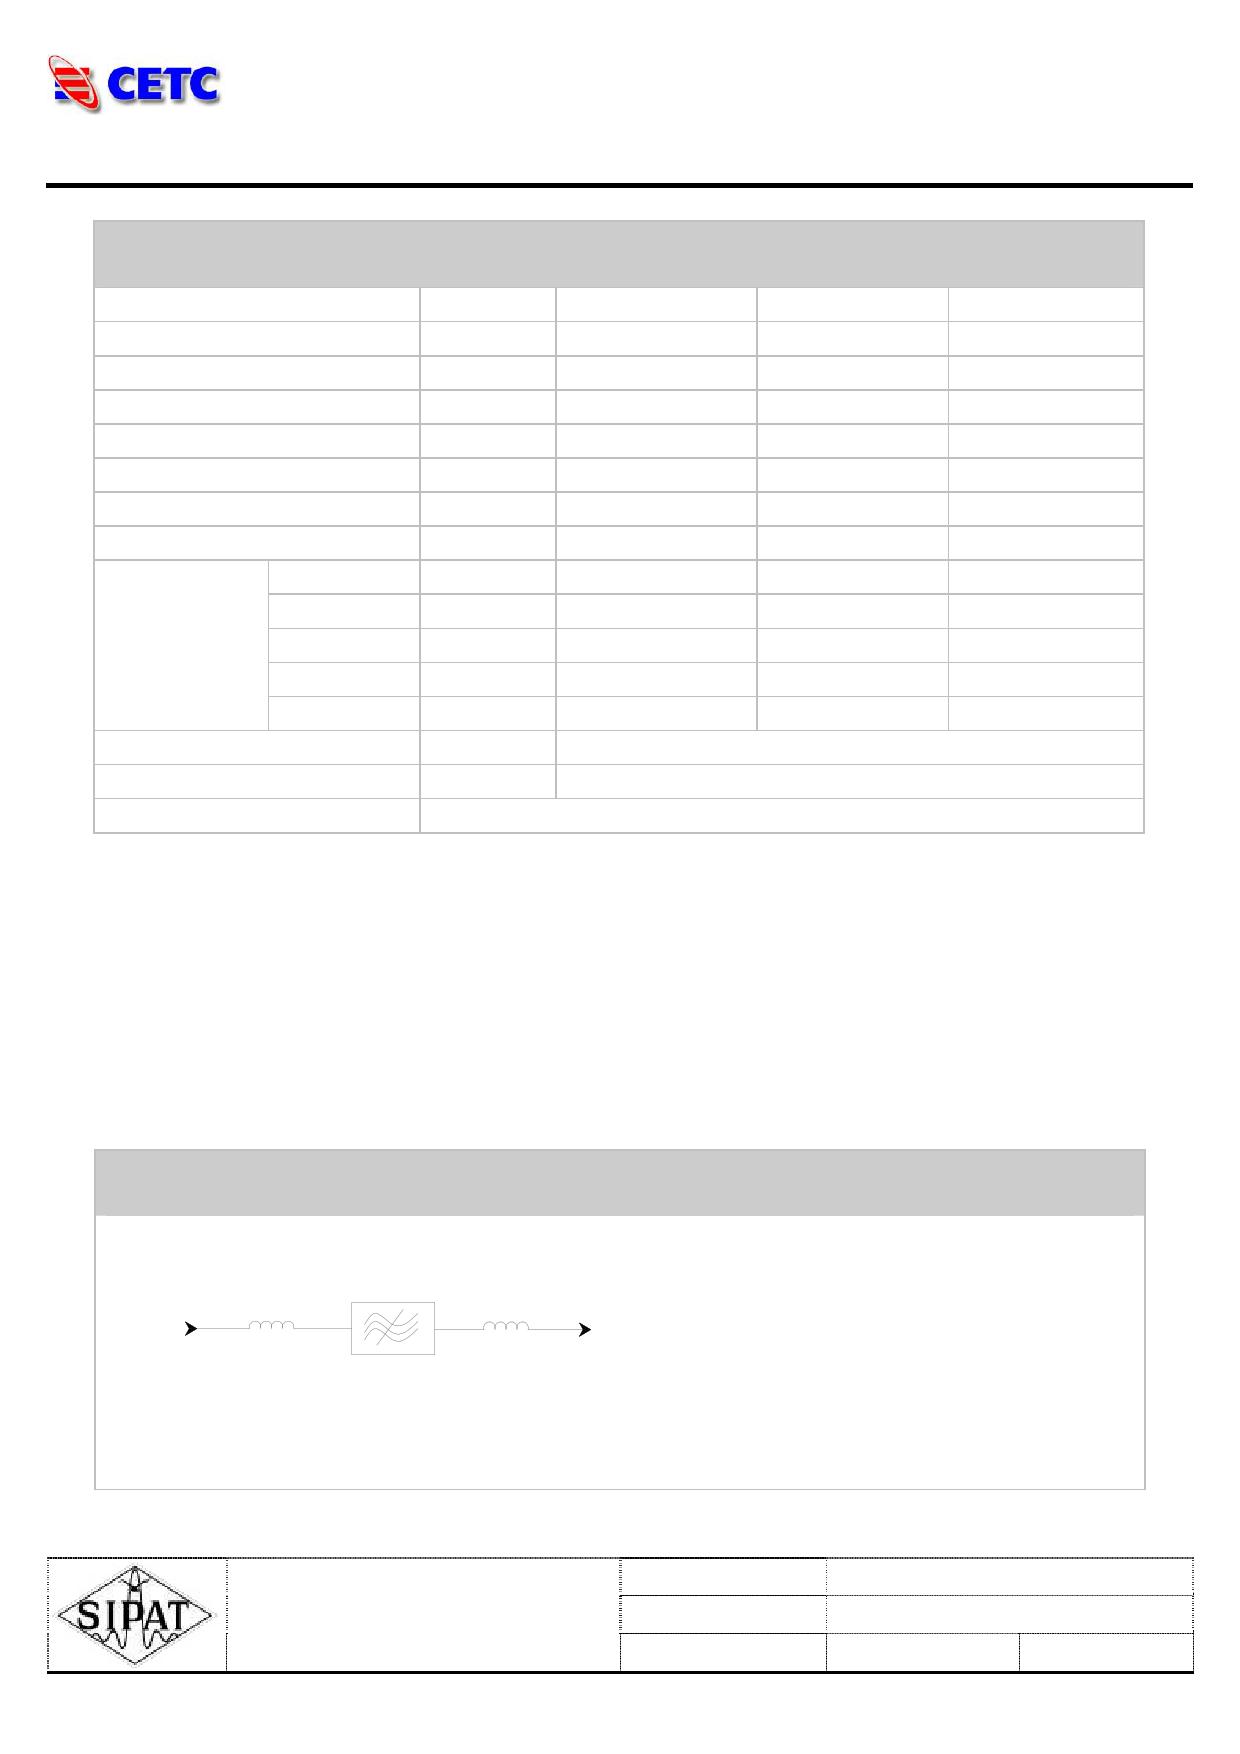 LBN70A32 datasheet